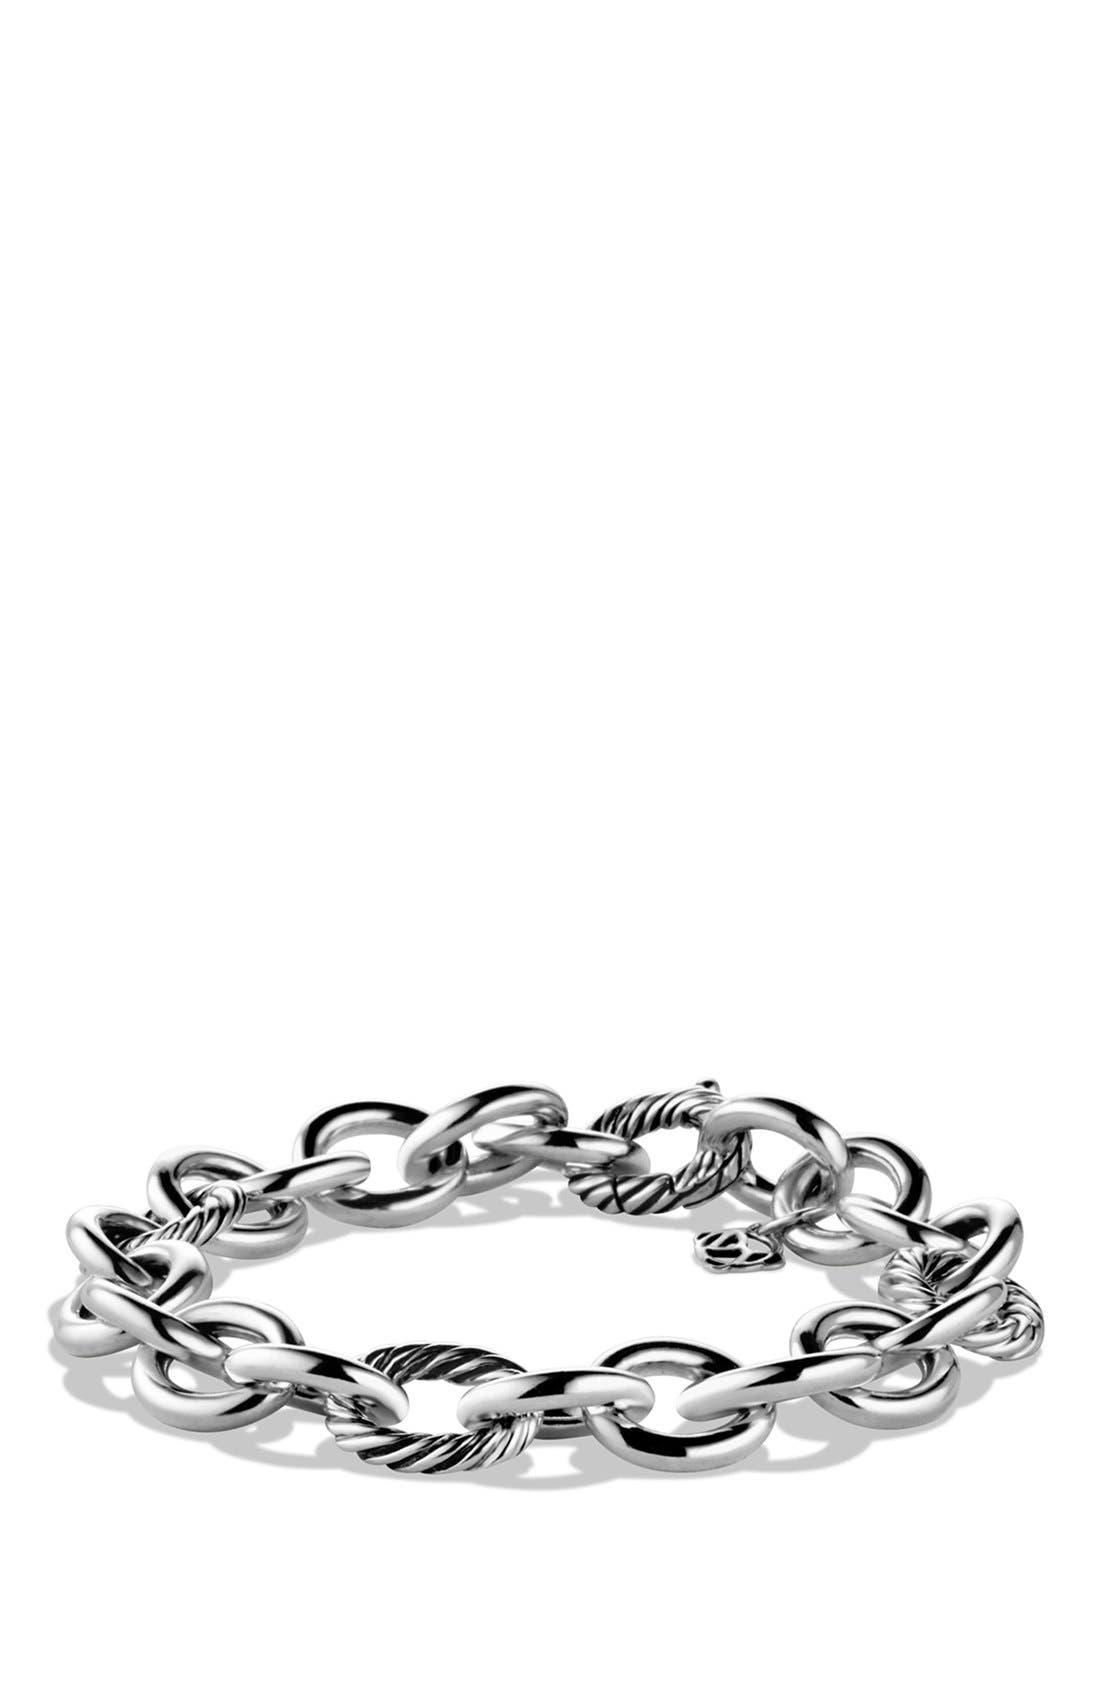 Alternate Image 1 Selected - David Yurman 'Oval' Large Link Bracelet